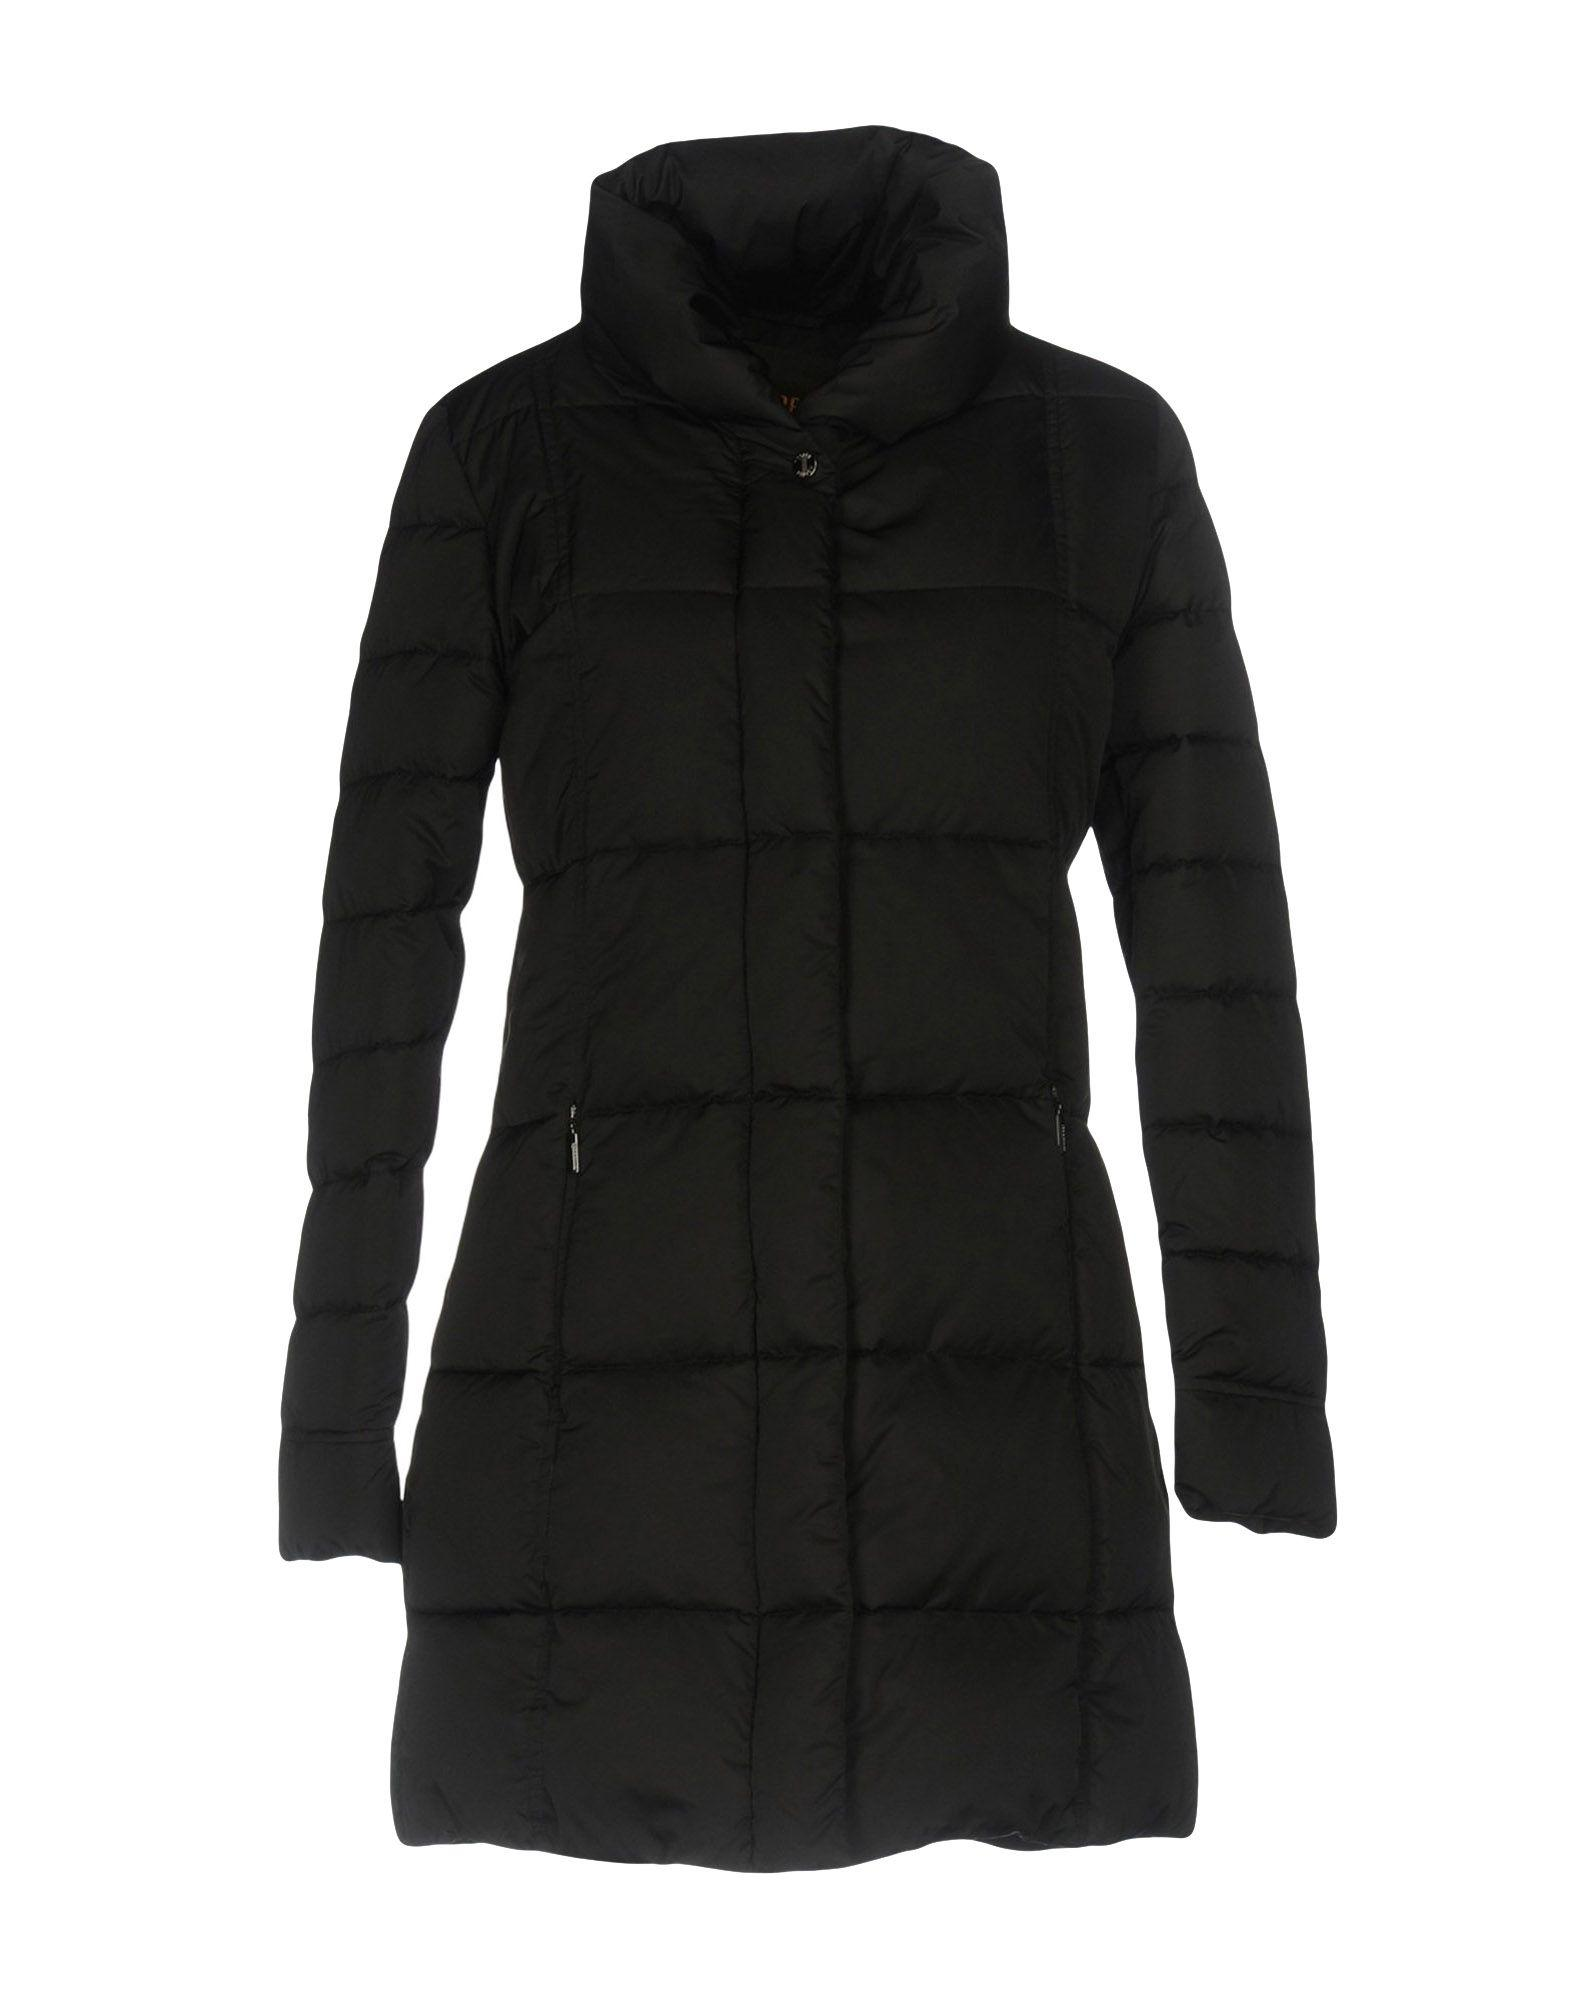 Moorer Down Jackets In Black